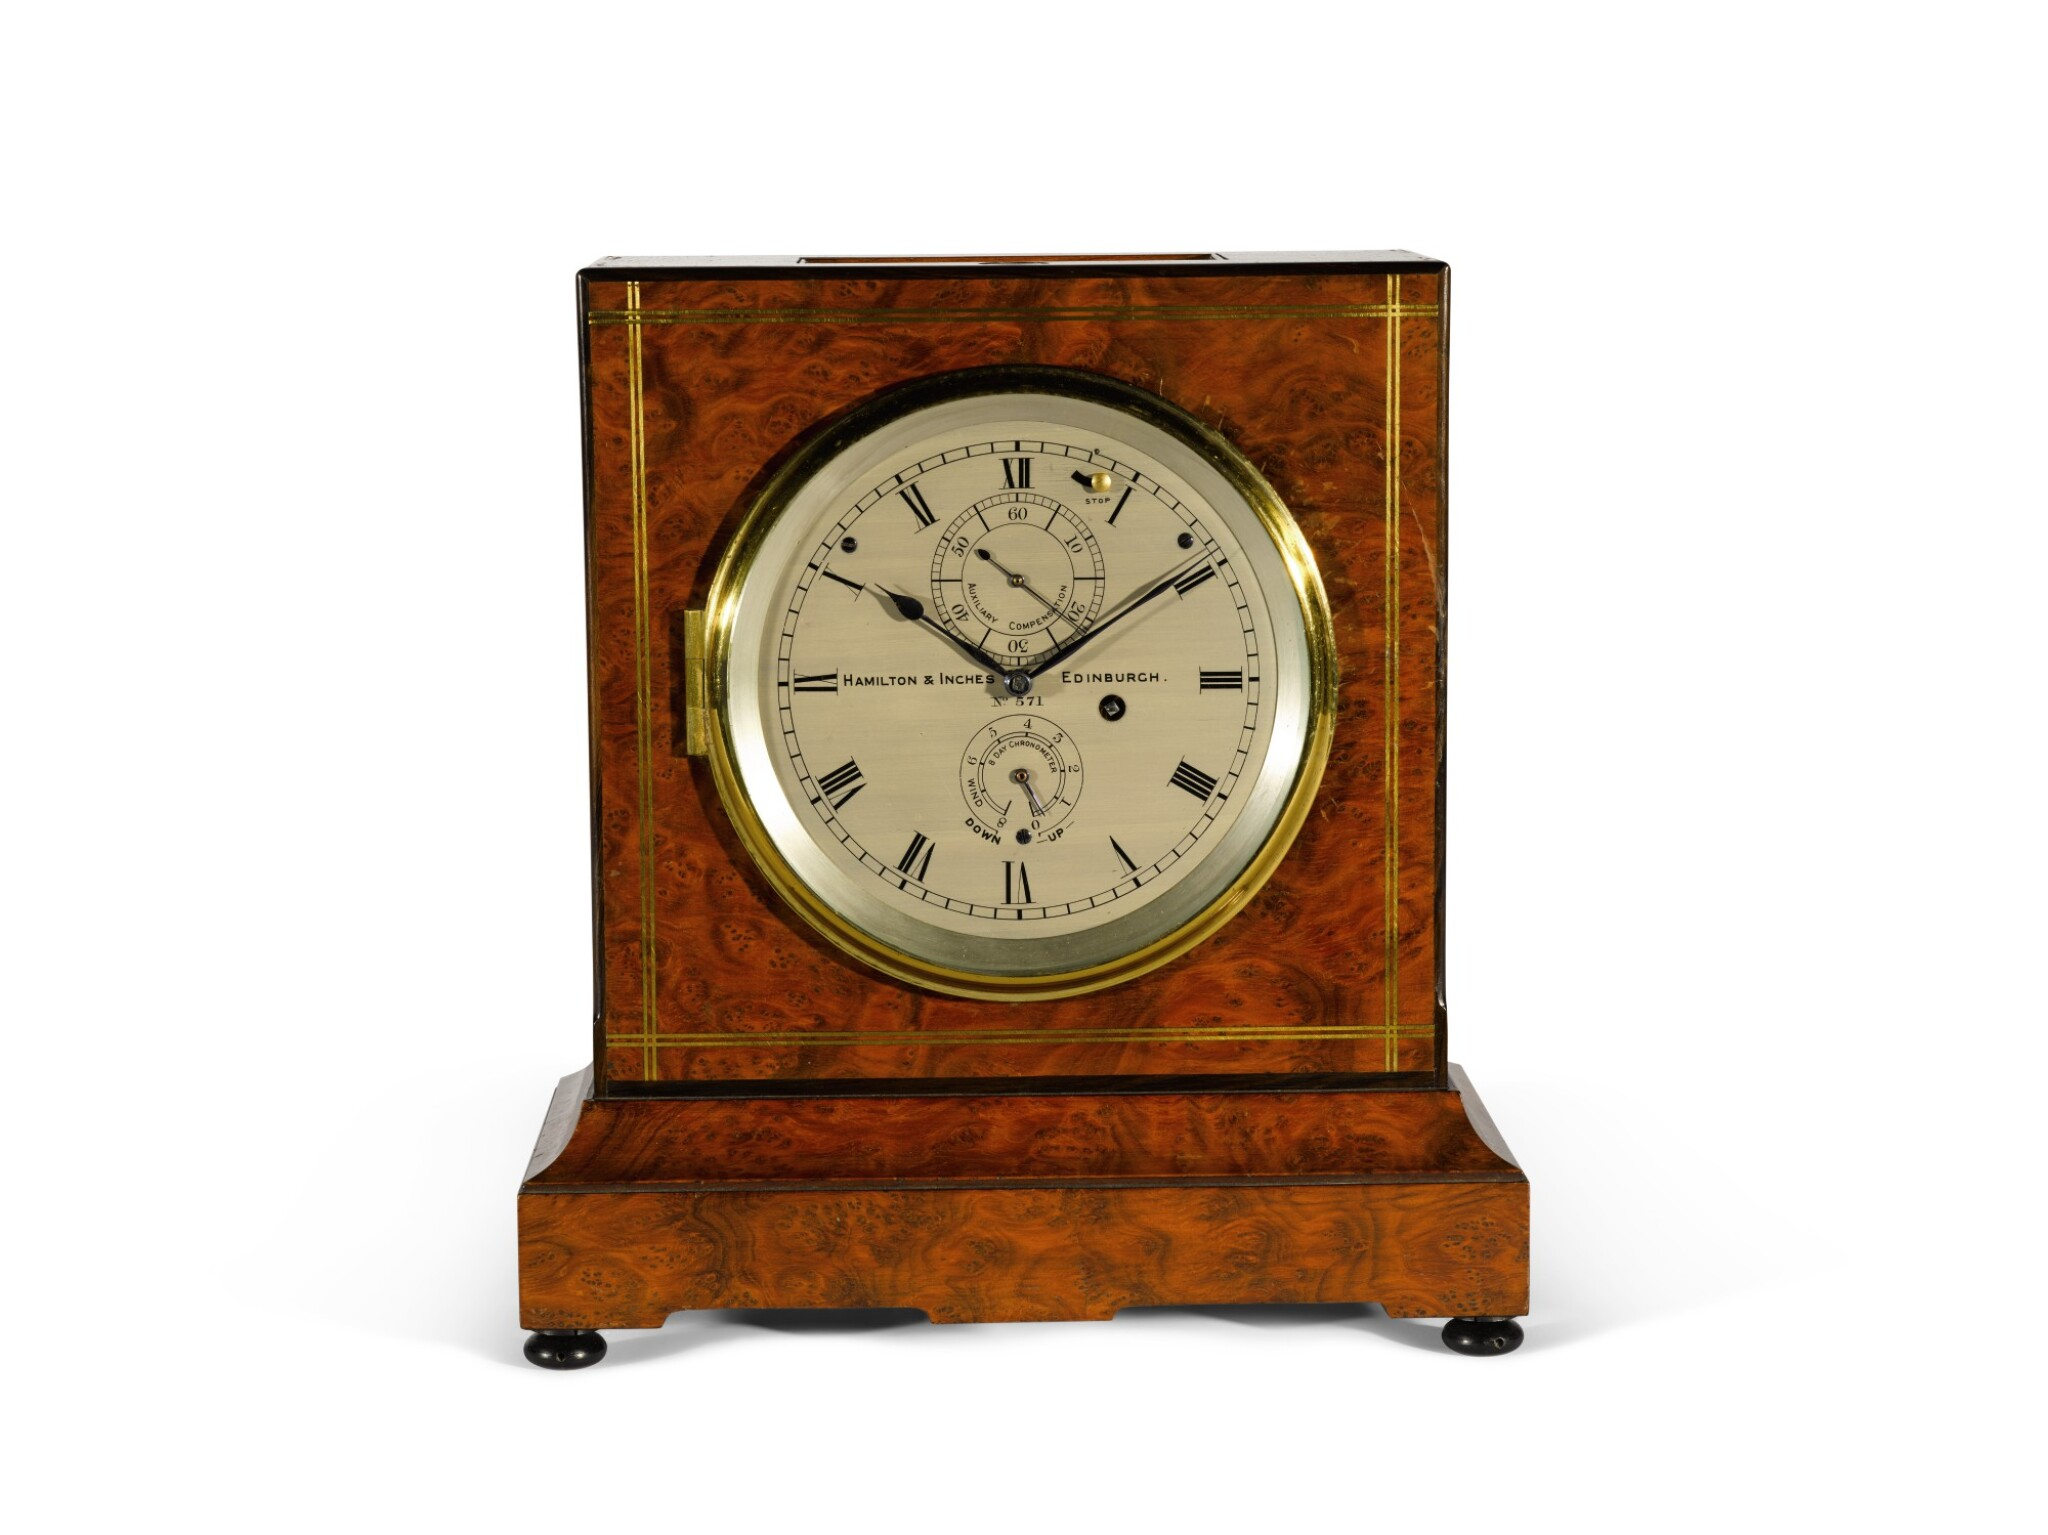 View full screen - View 1 of Lot 137. Thomas Mercer No.571. A burr-walnut 8-day mantel chronometer retailed by Hamilton & Inches, Edinburgh, circa 1920.